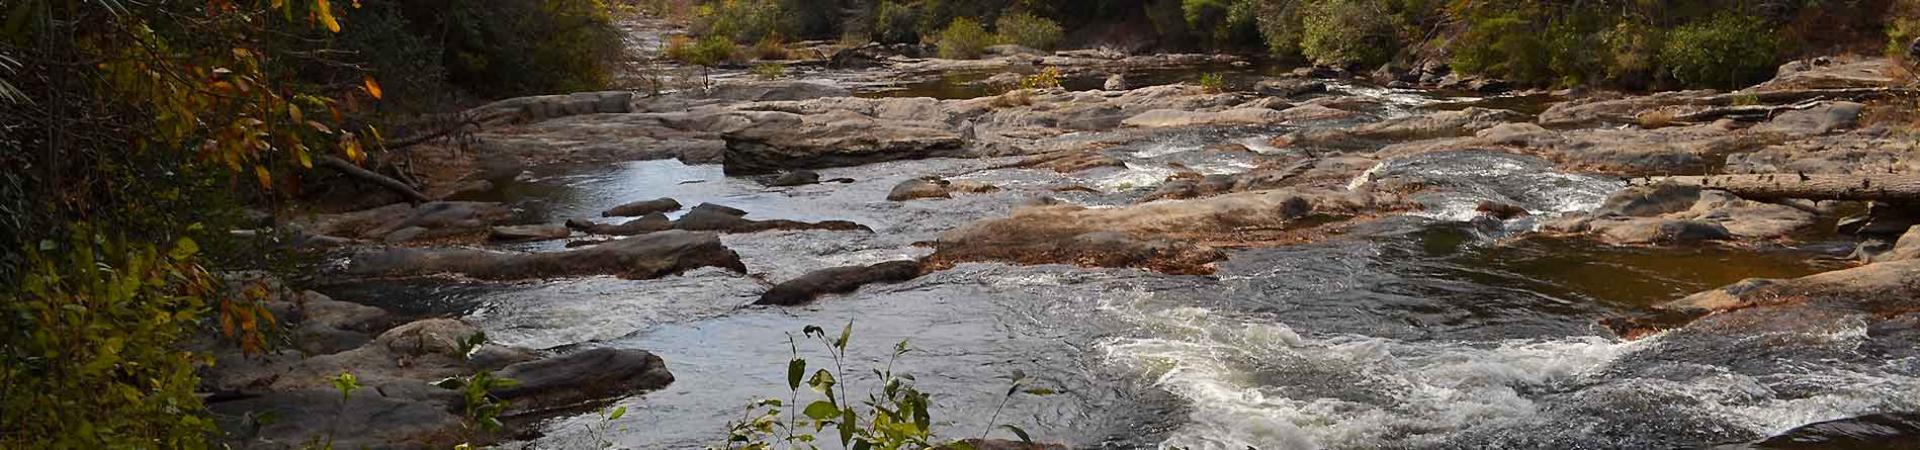 river running through rocks